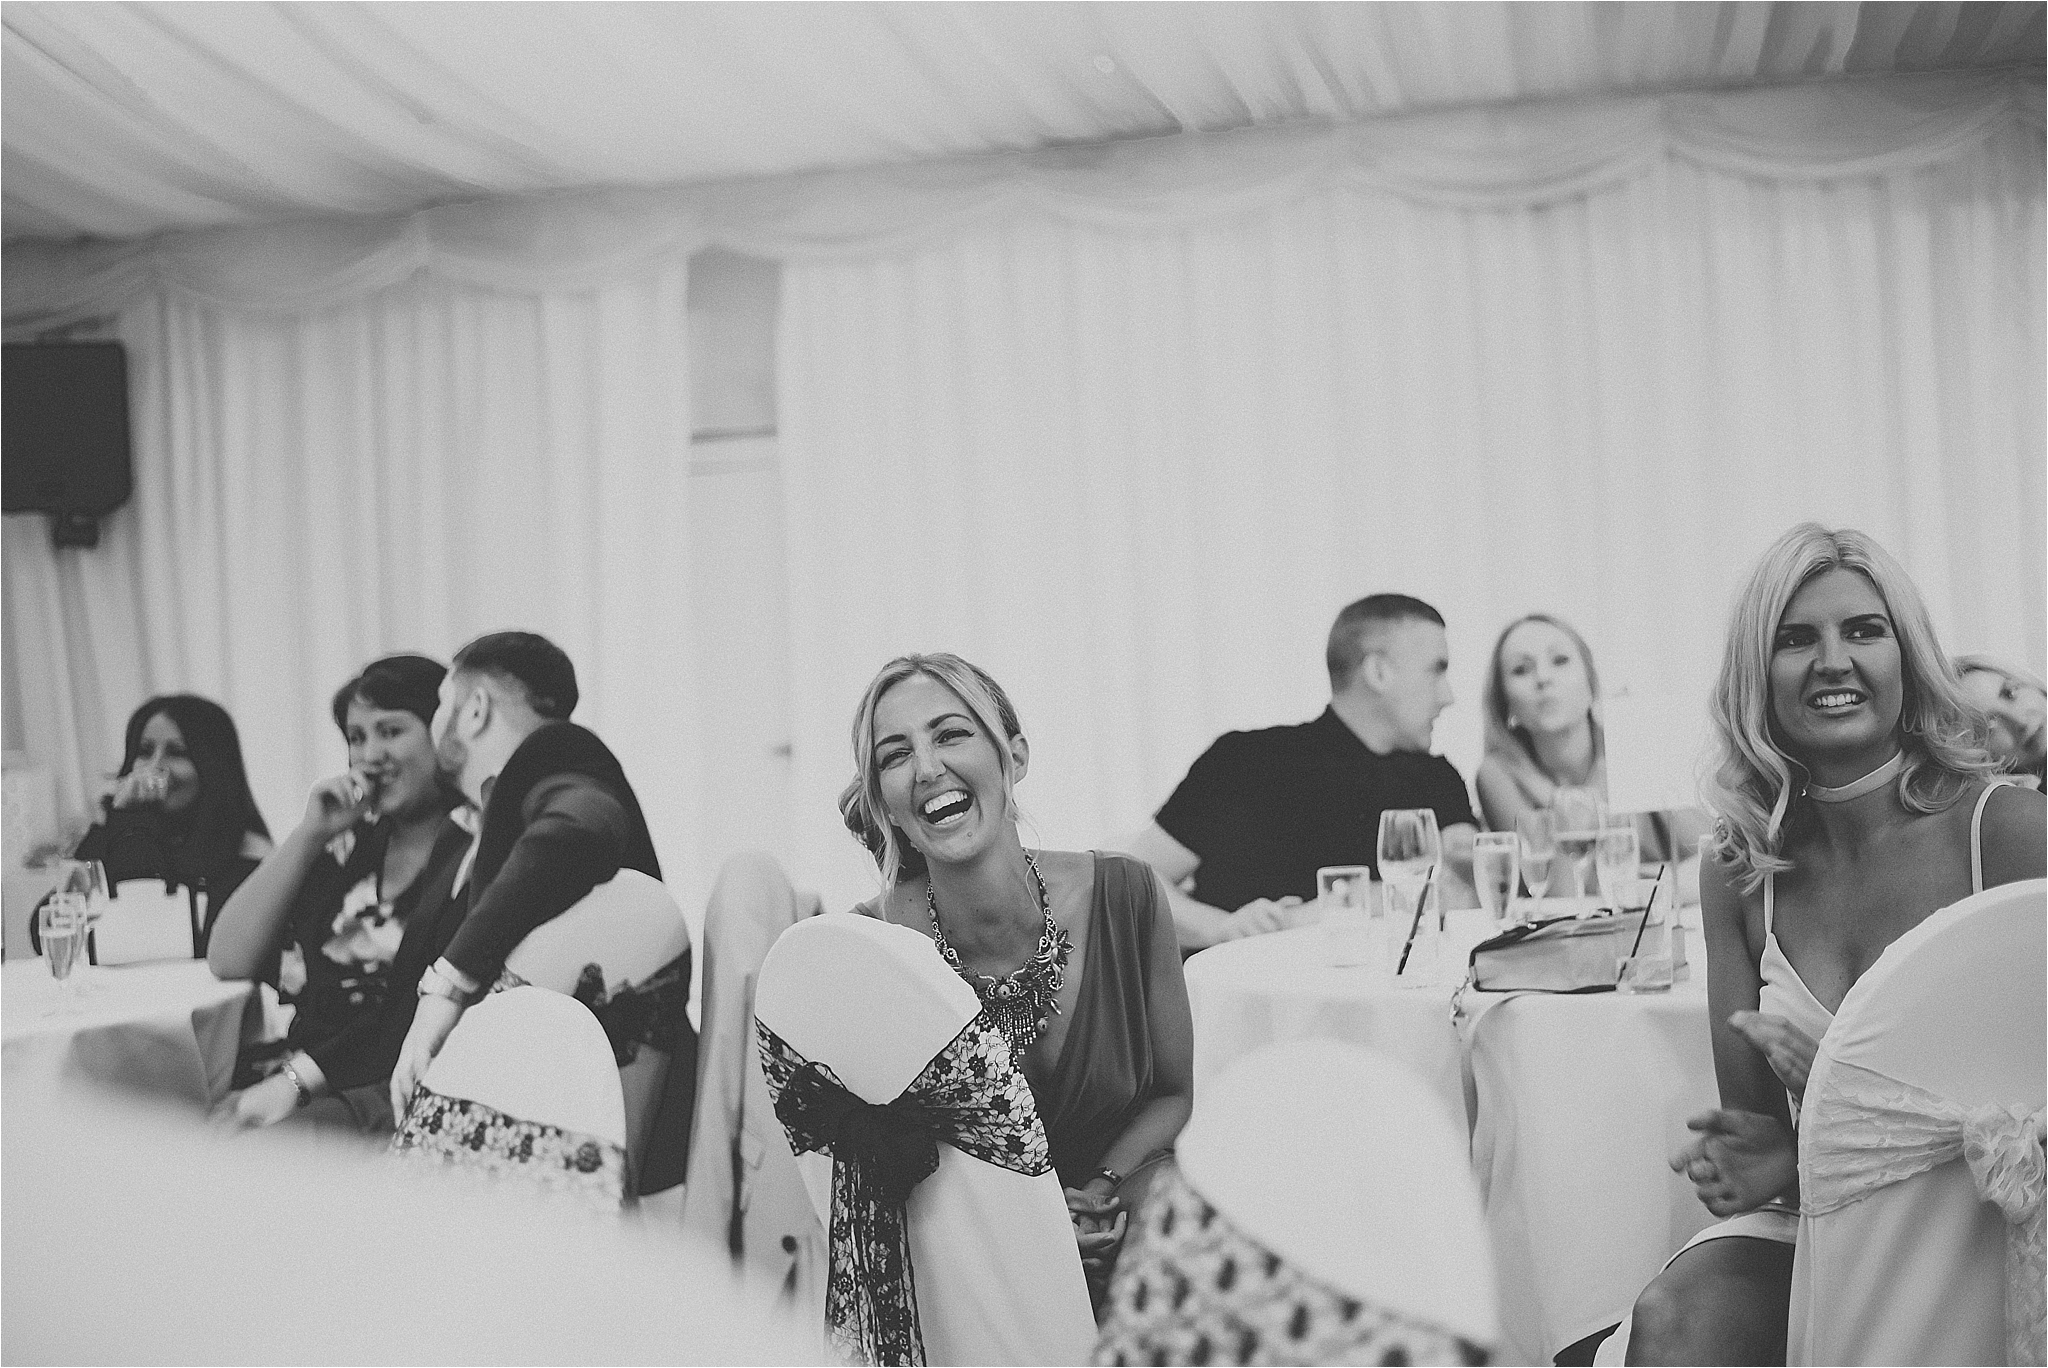 thevilla+lancashire+wreagreen+wedding+photographer55.jpg